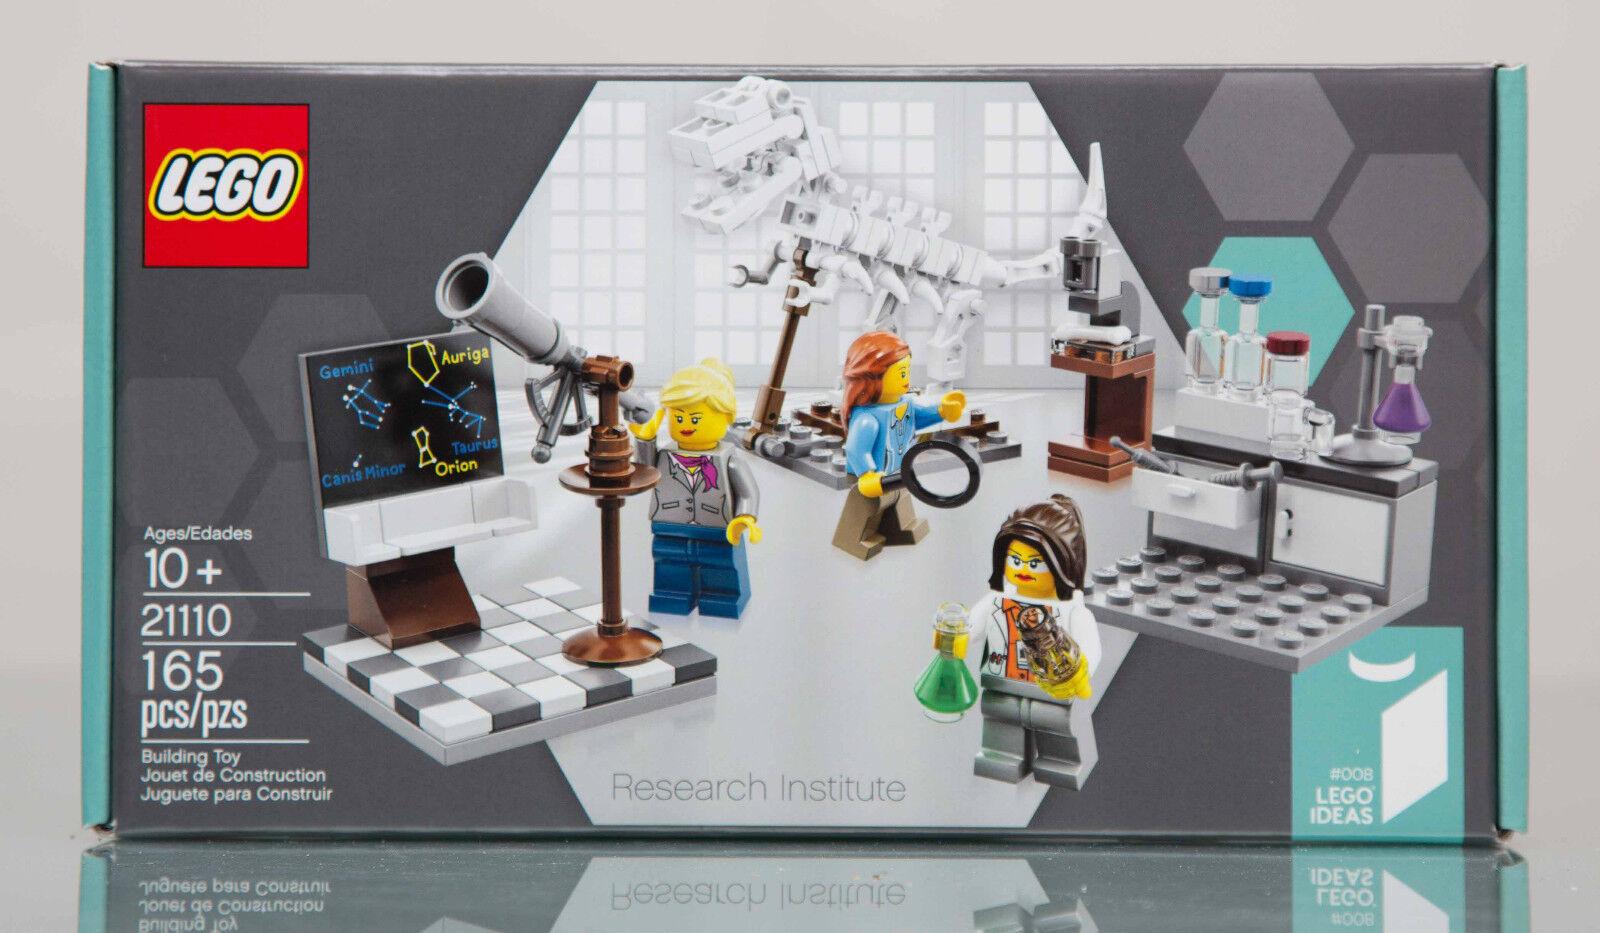 LEGO Research Institute - 21110 -New